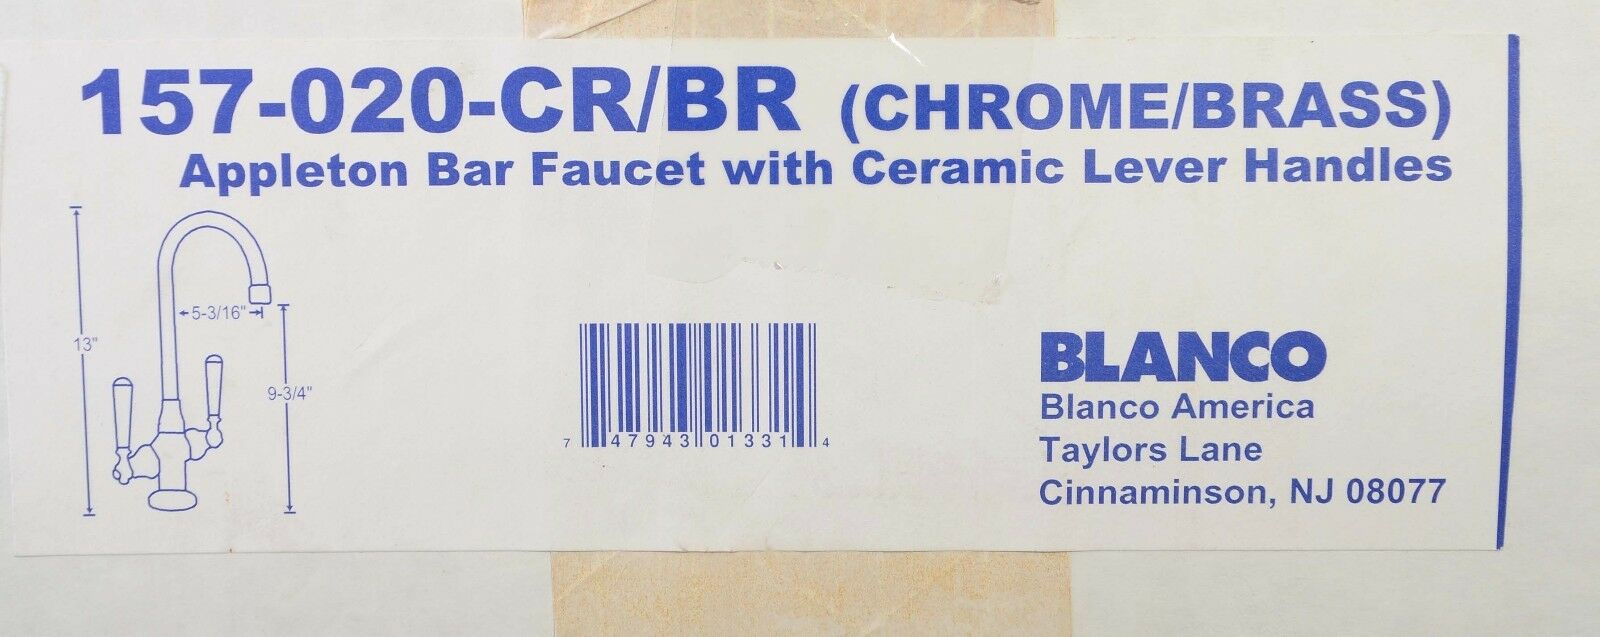 Chrome Brass Bar Faucet Blanco 157-020-CR//BR Appleton 2 Ceramic Handle Classic